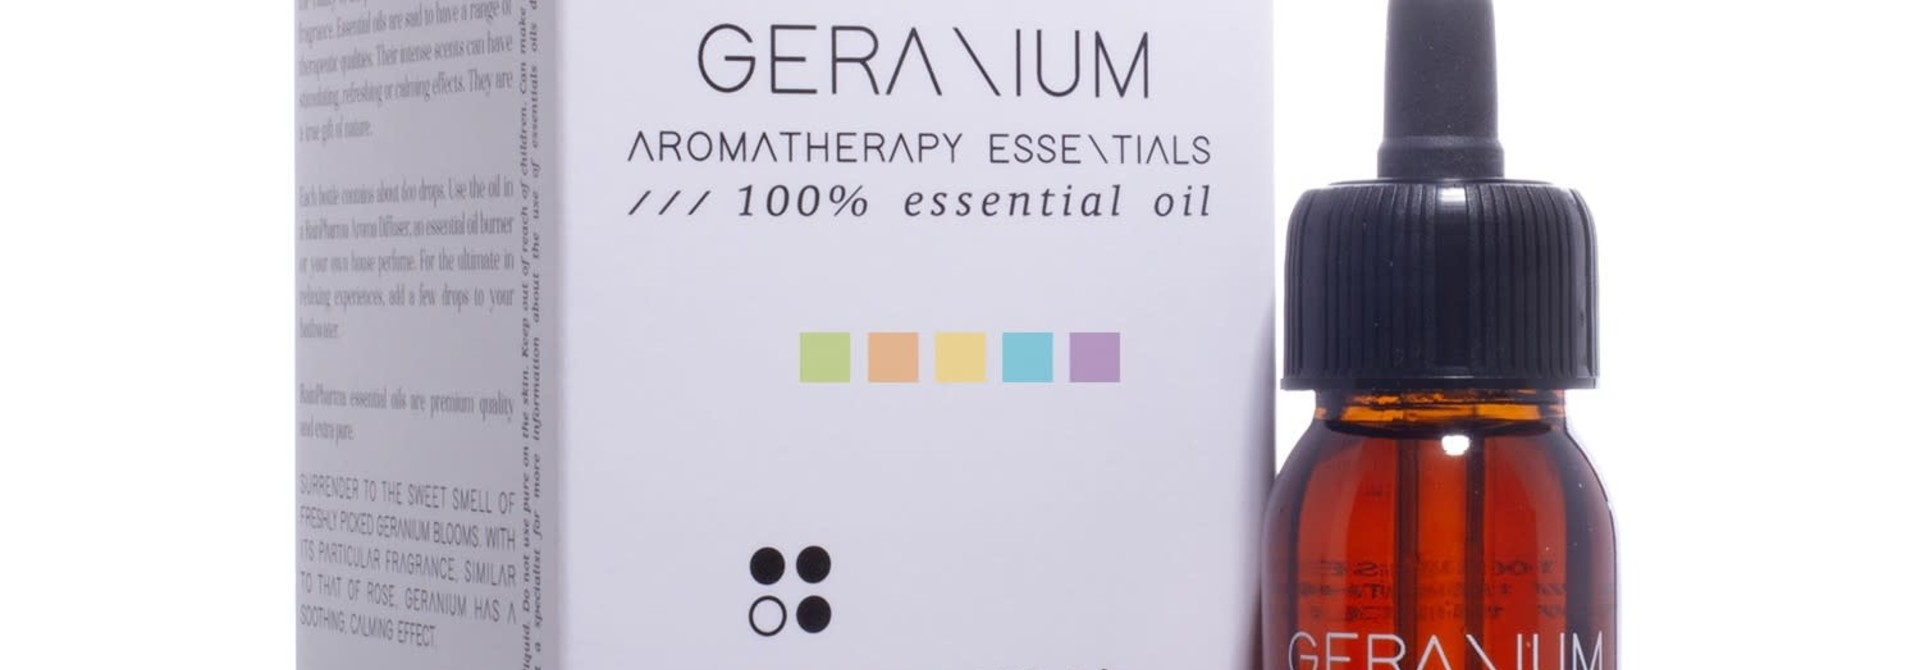 Geranium Aromatherapy Essential Oils